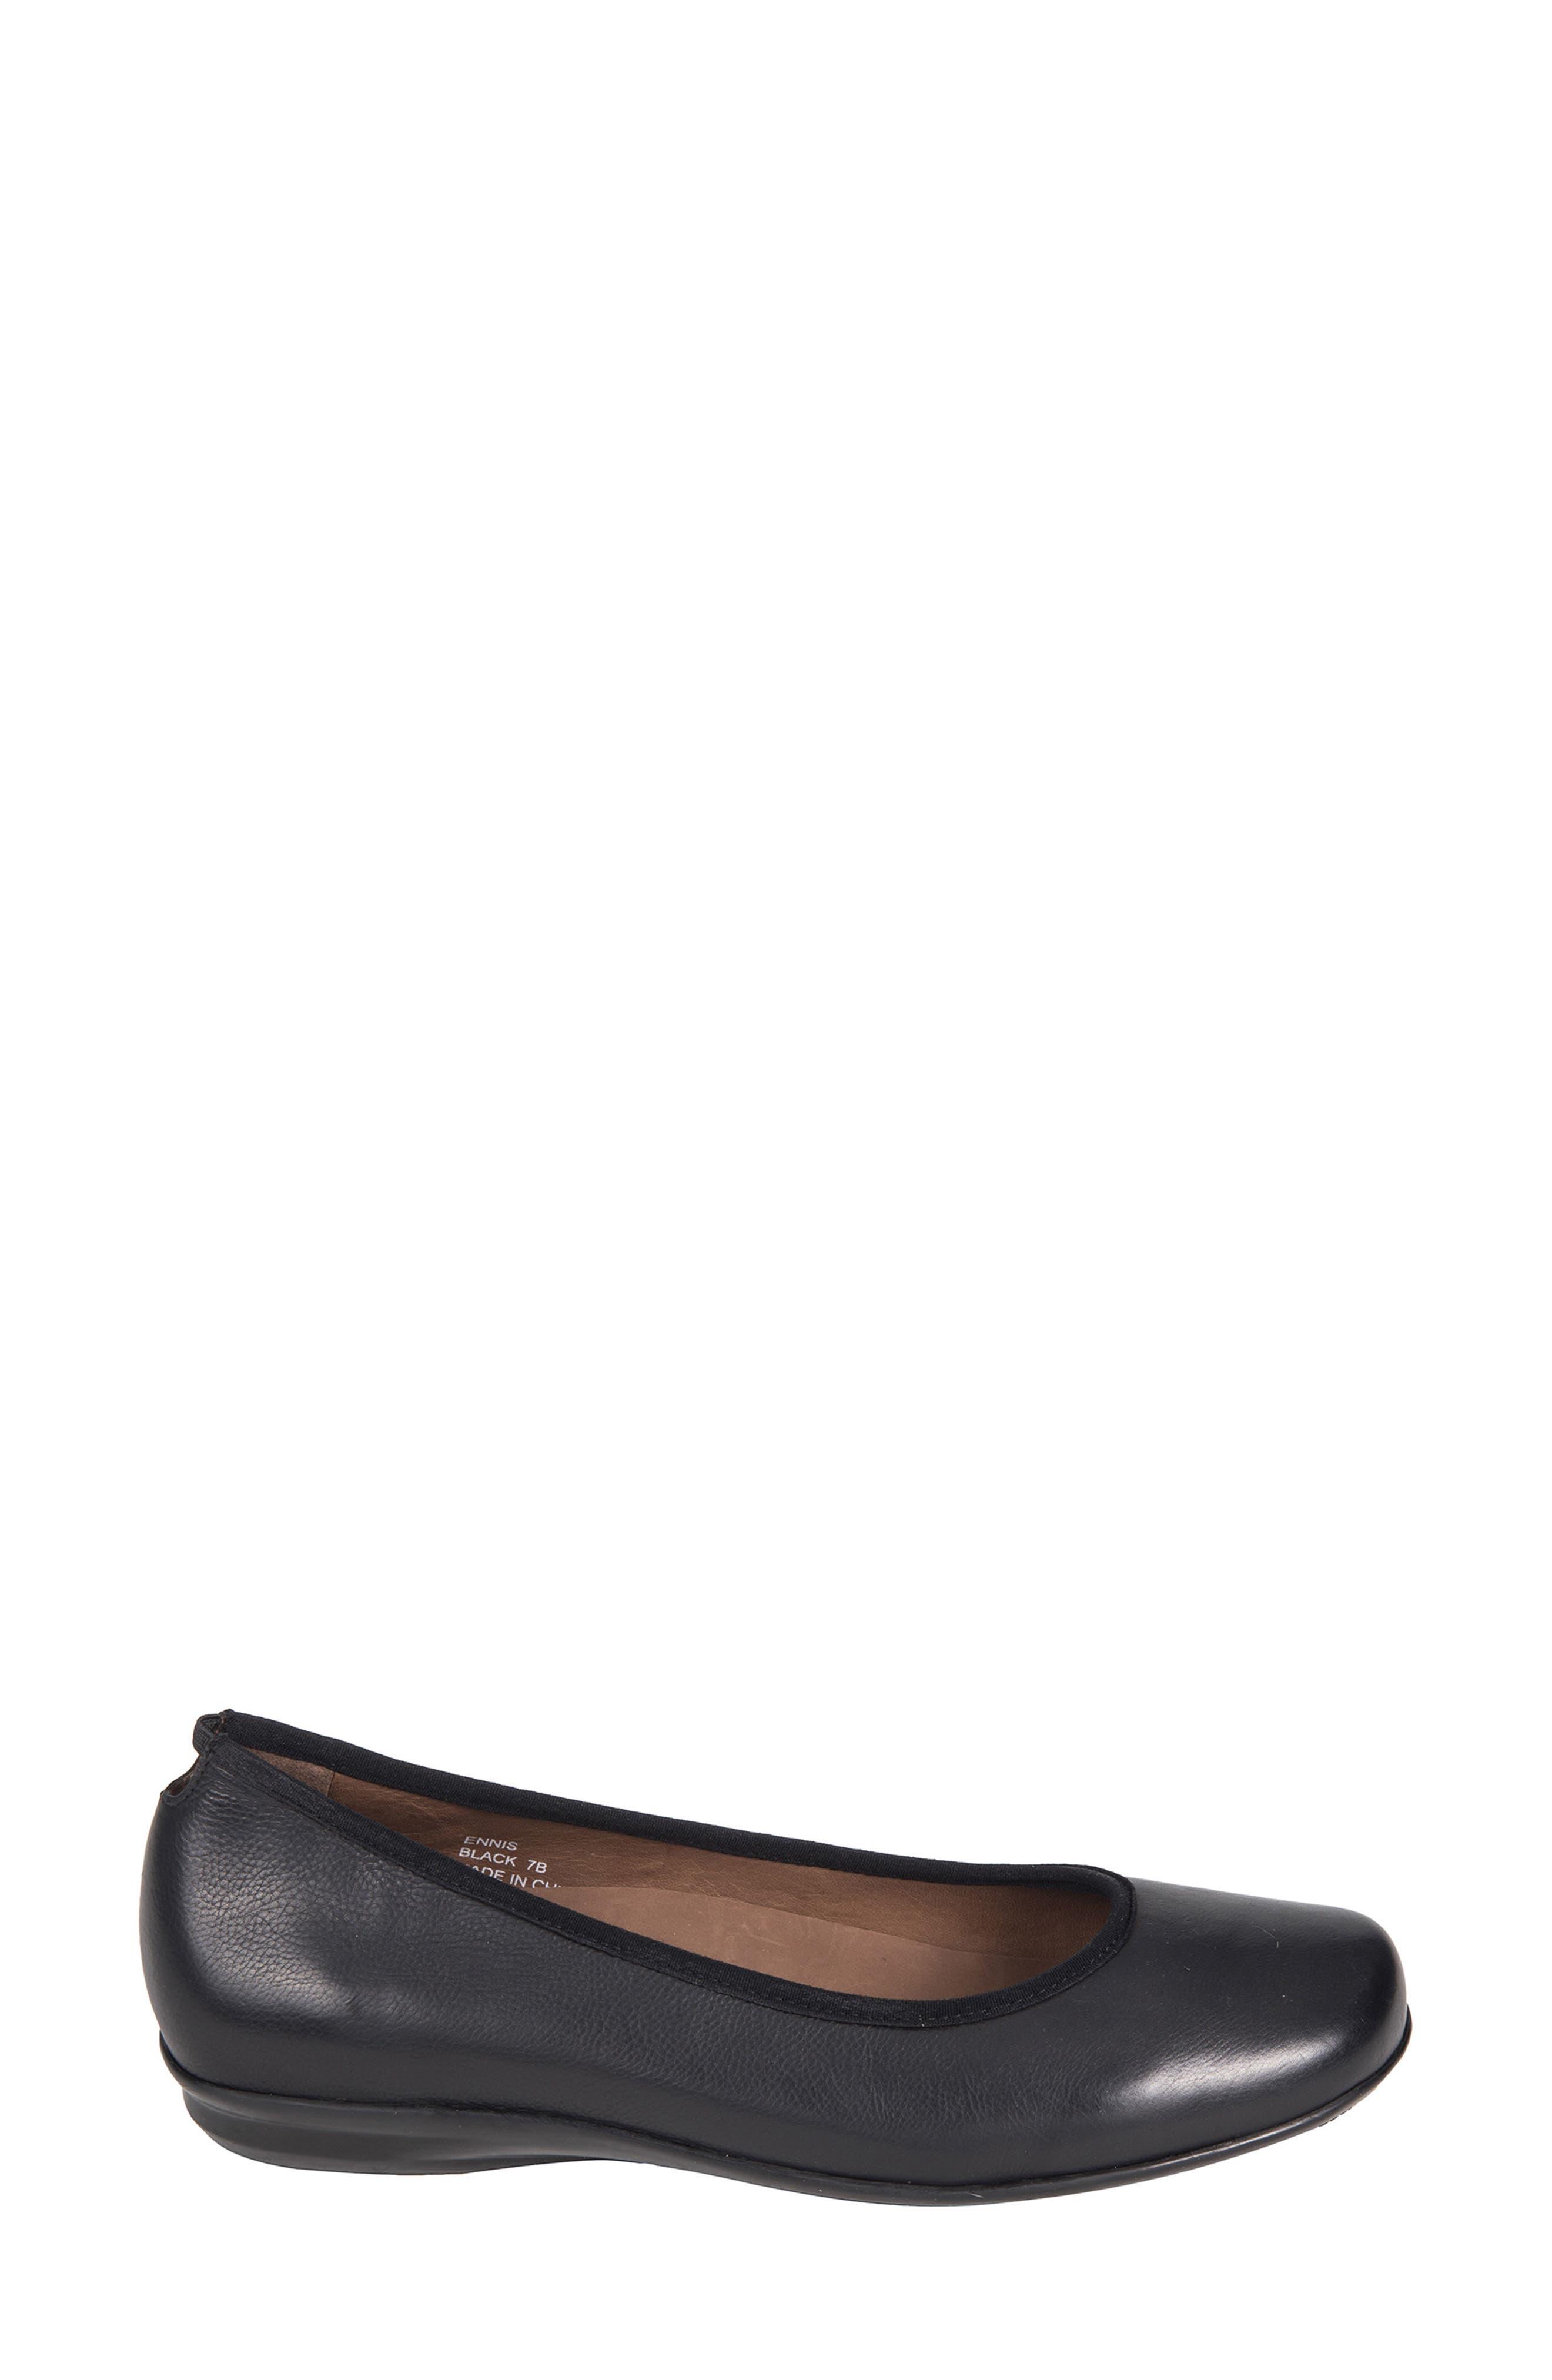 Ennis Flat,                             Alternate thumbnail 3, color,                             Black Leather